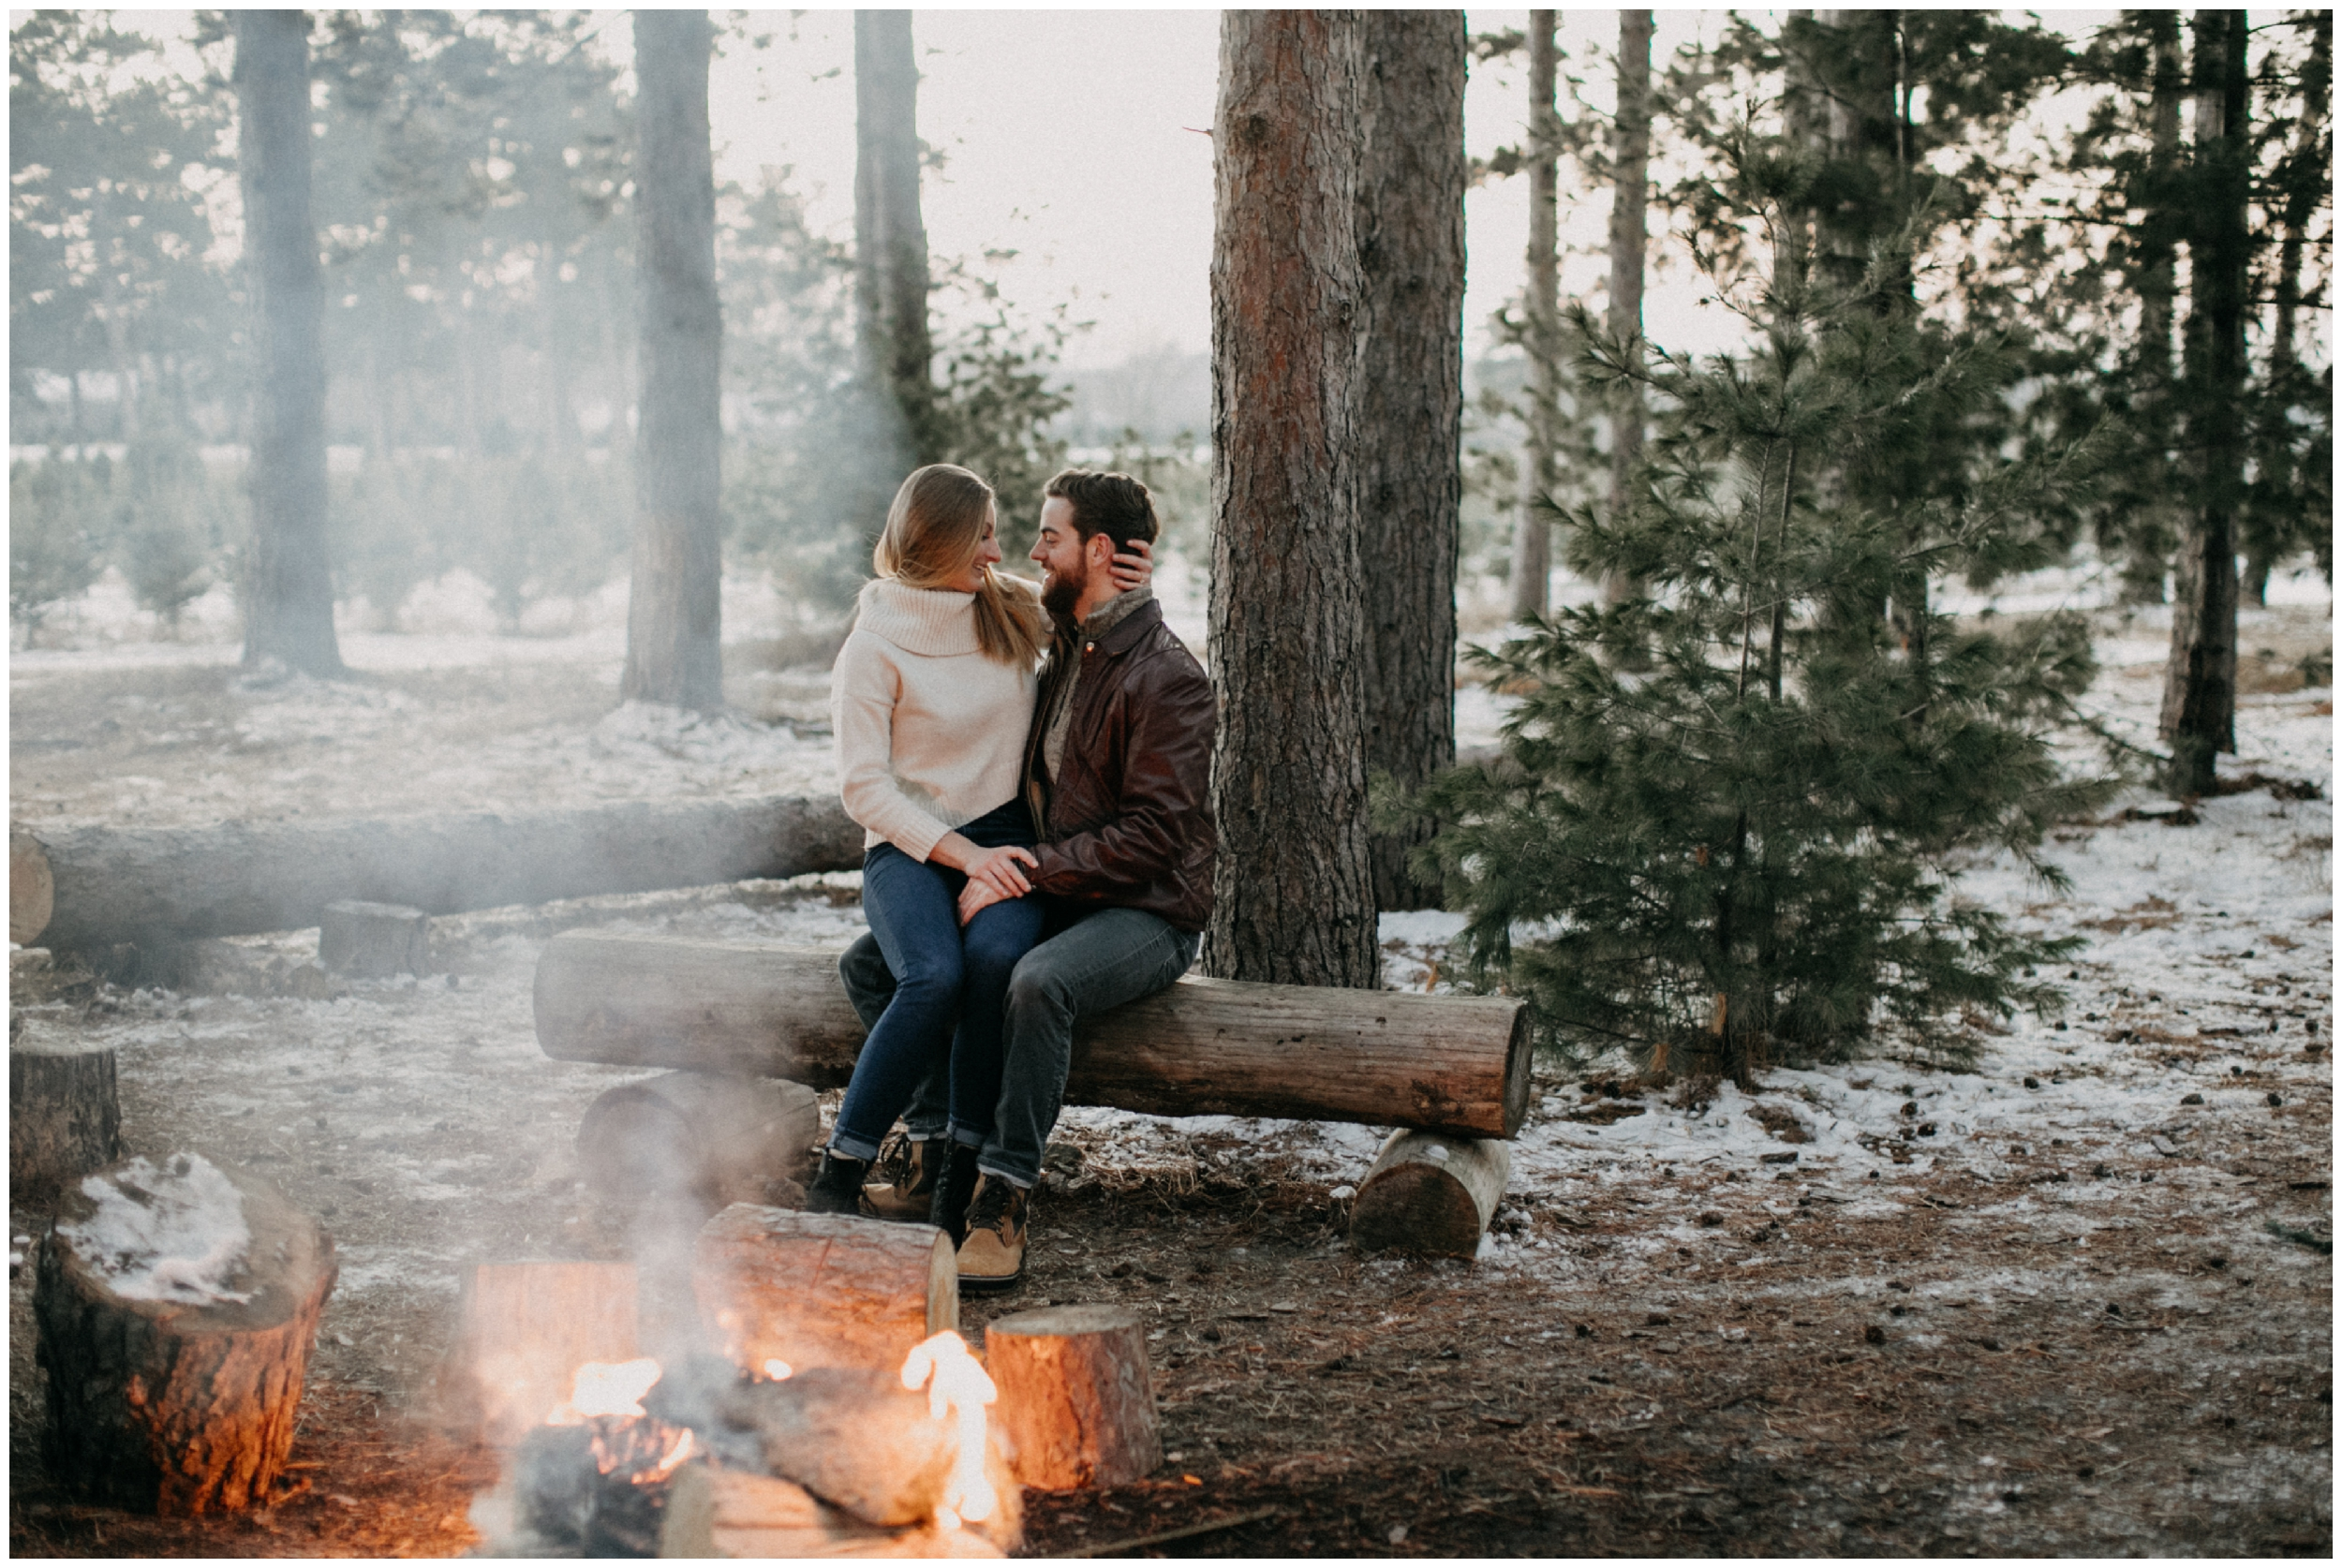 Romantic and cozy winter bonfire engagement session by Brainerd photographer Britt DeZeeuw